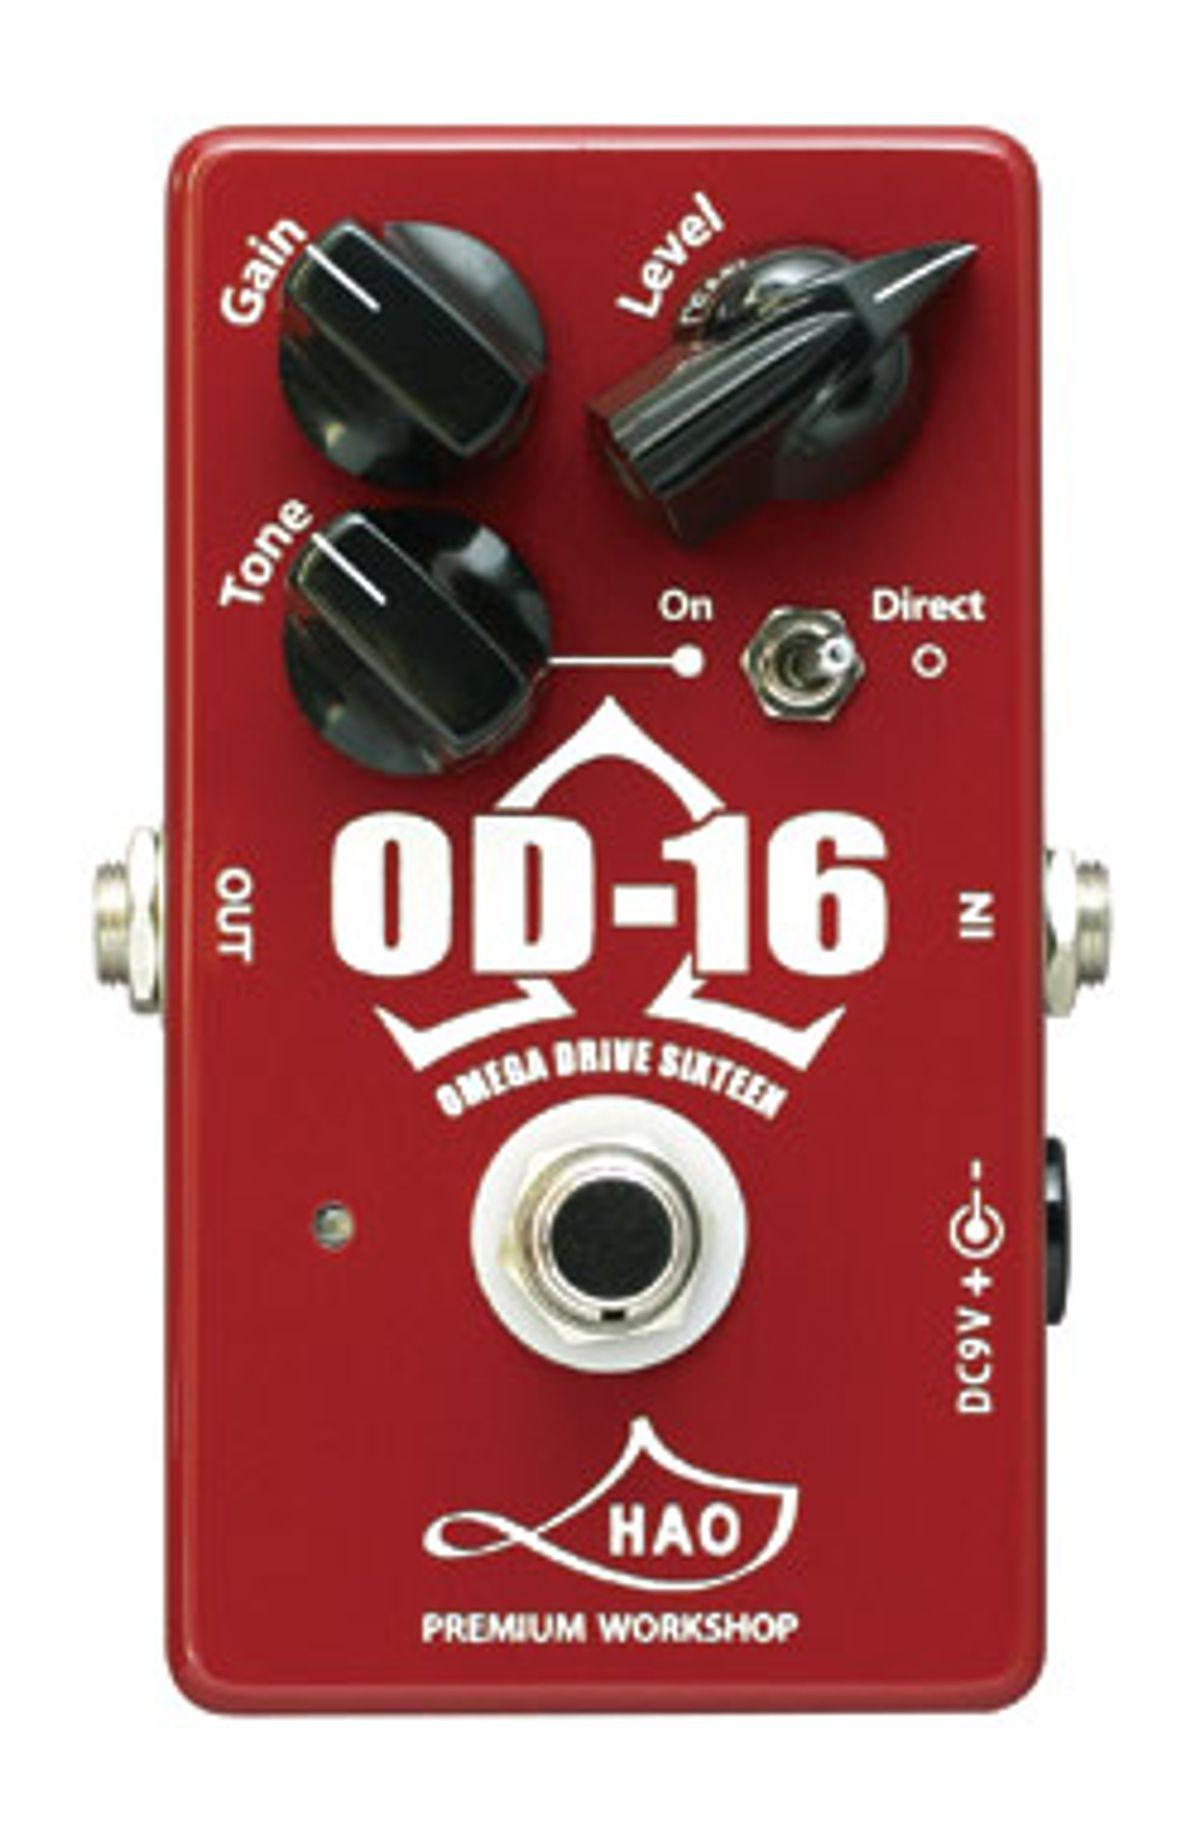 Godlyke Releases HAO Premium Workshop Omega Drive Sixteen Overdrive Pedal